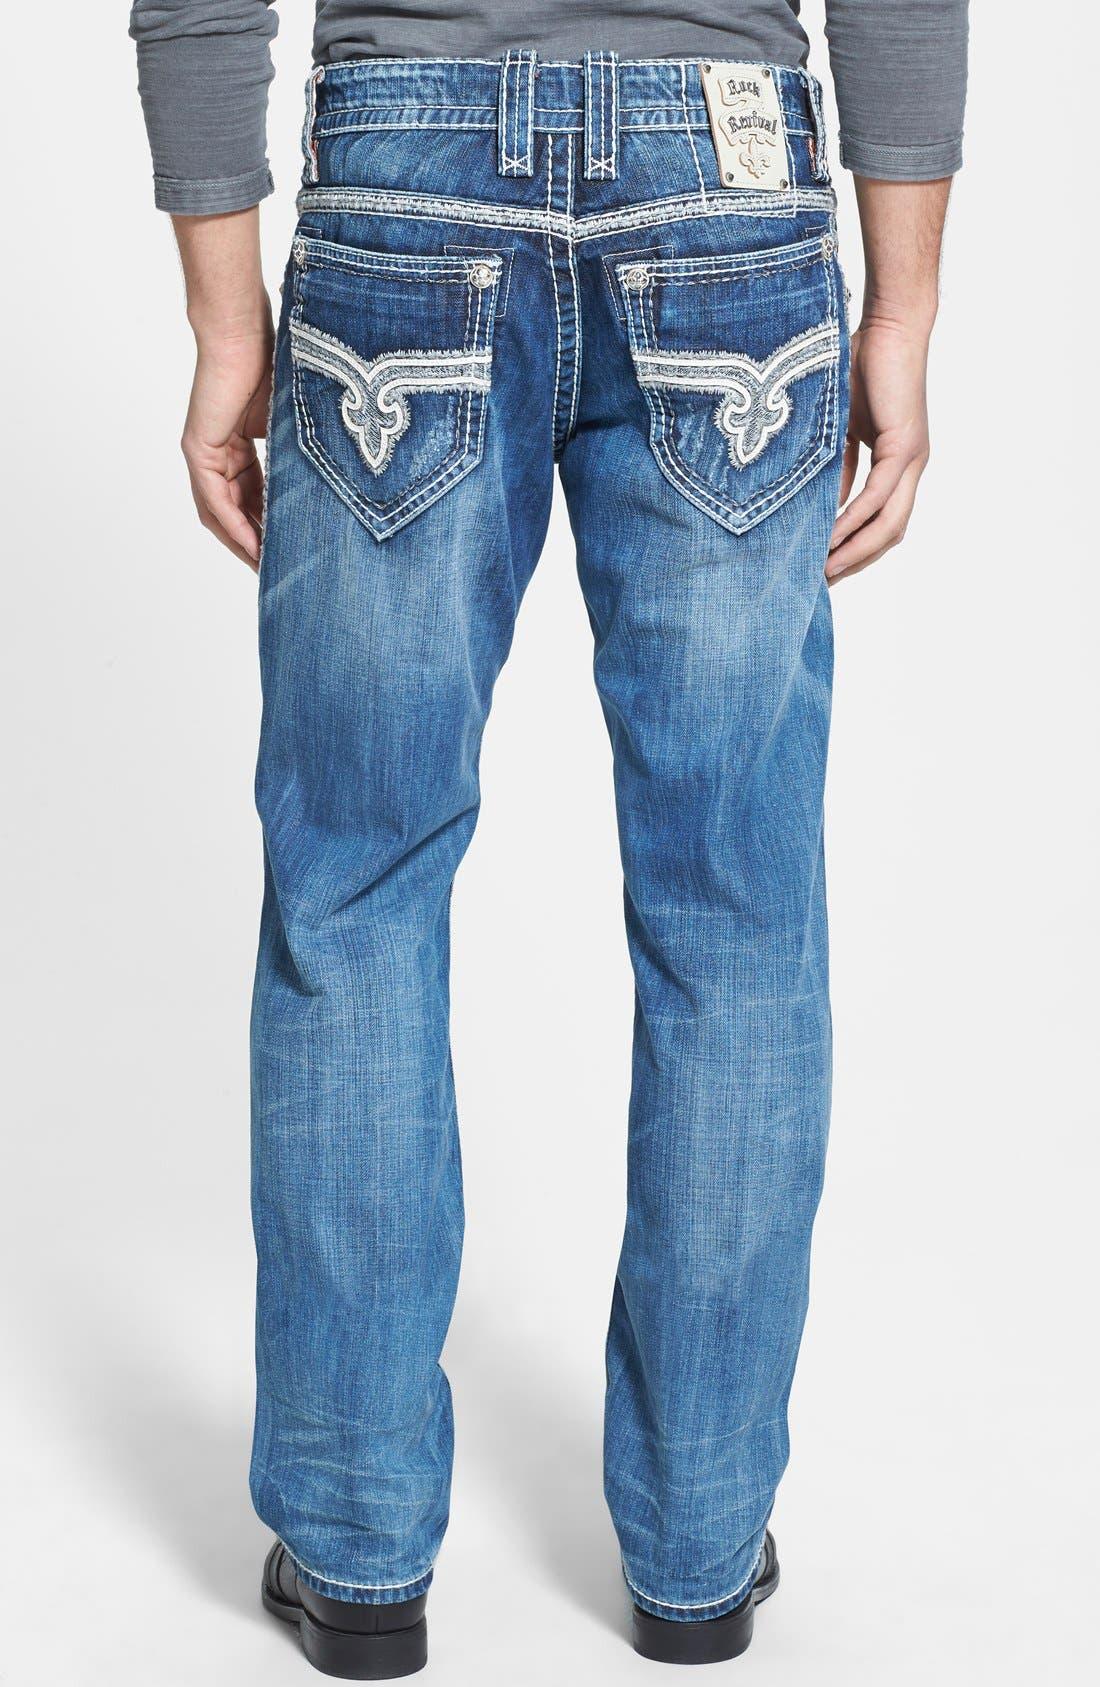 Alternate Image 1 Selected - Rock Revival 'Rogan' Bootcut Jeans (Medium Blue)